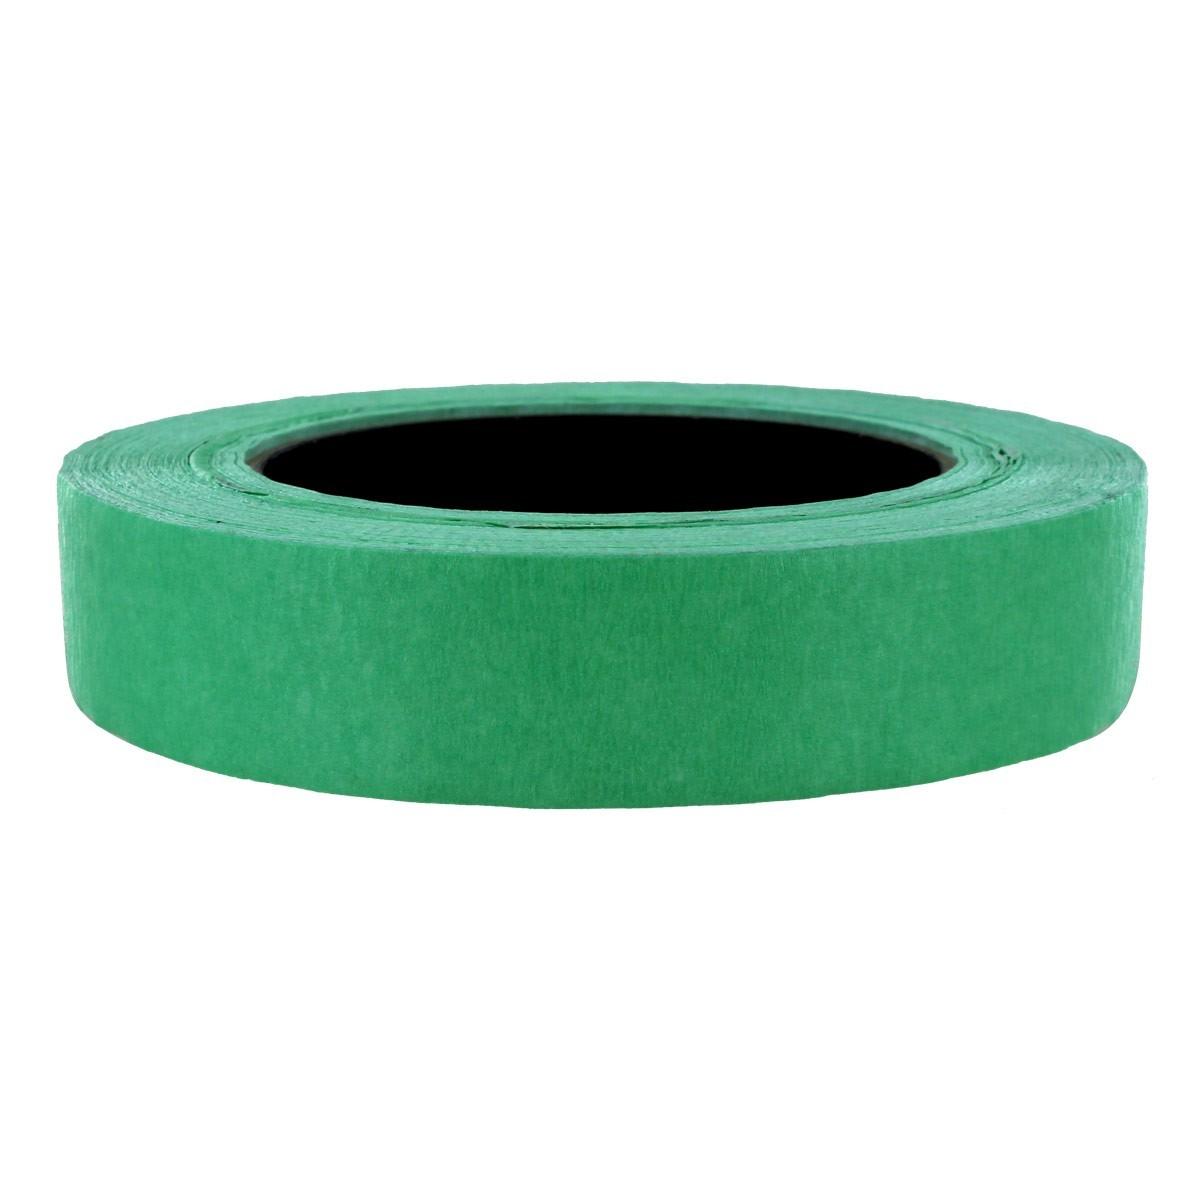 Masking Painters Tape, Green, 36 mm x 55 m, 32/cs